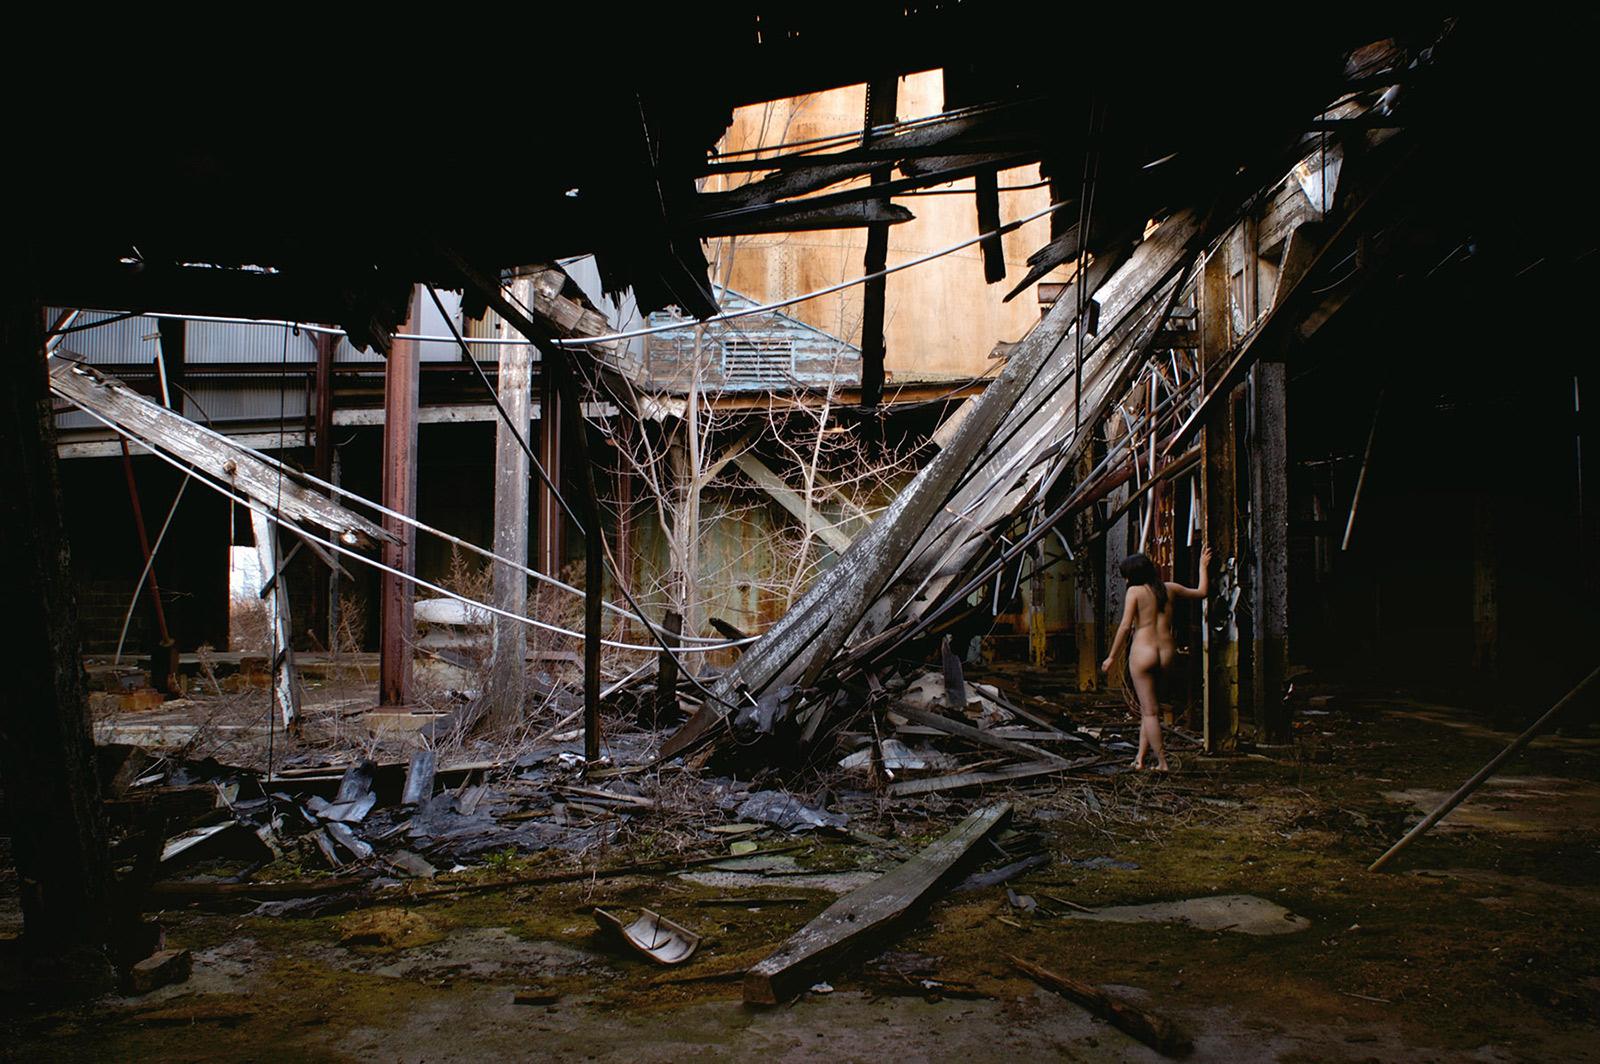 Revere Sugar Factory, Red Hook, Brooklyn, NY, USA #3